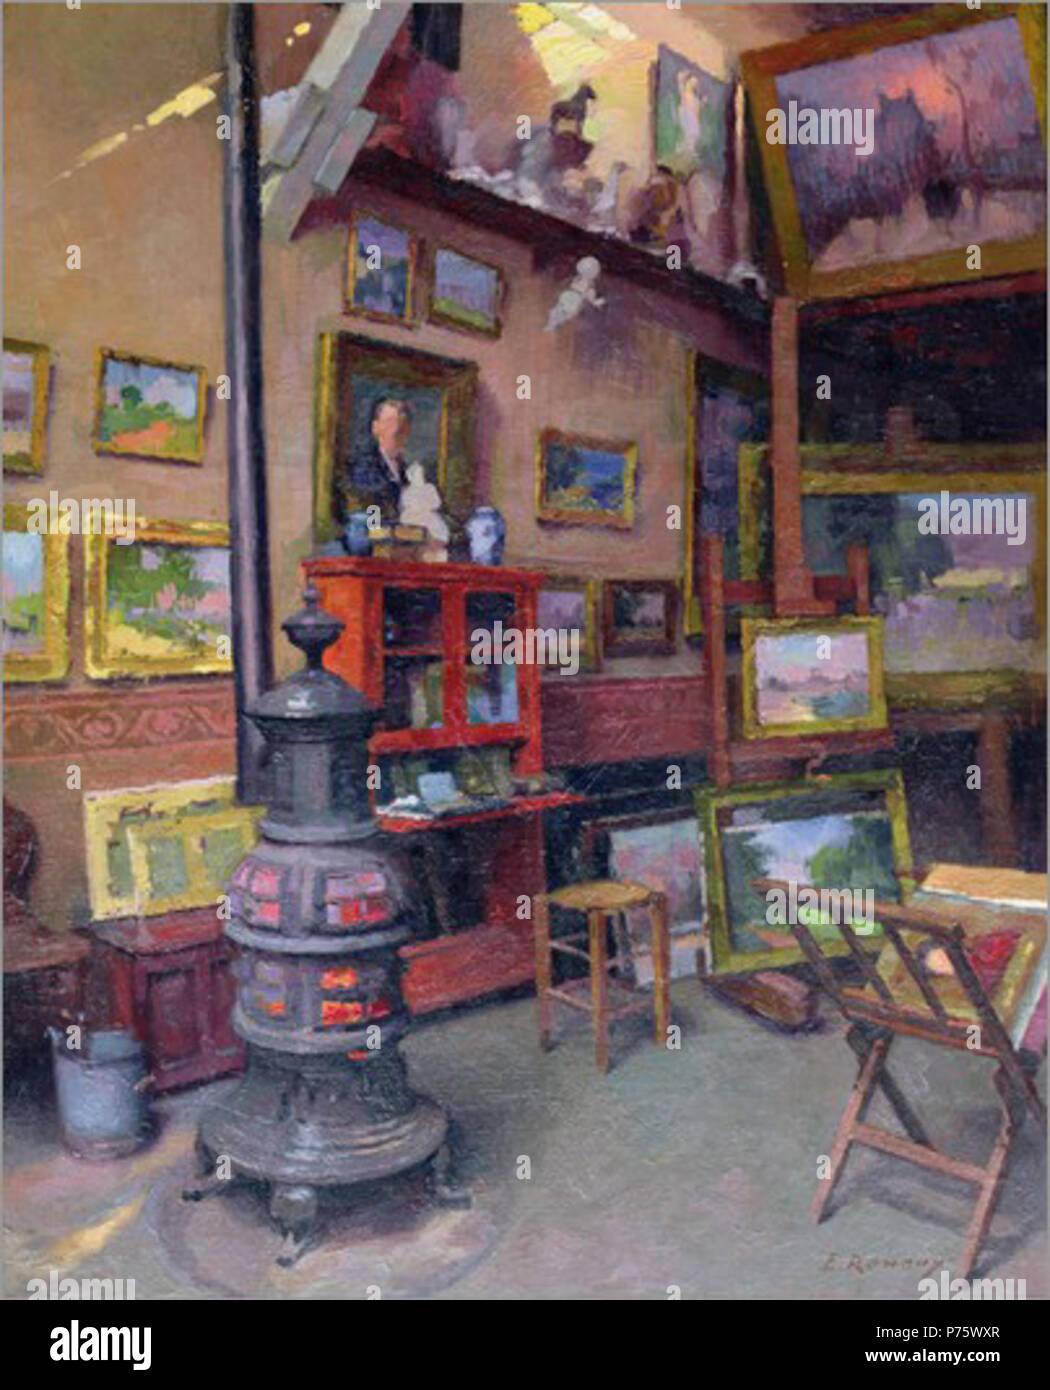 L Atelier 50 renoux stock photos & renoux stock images - alamy